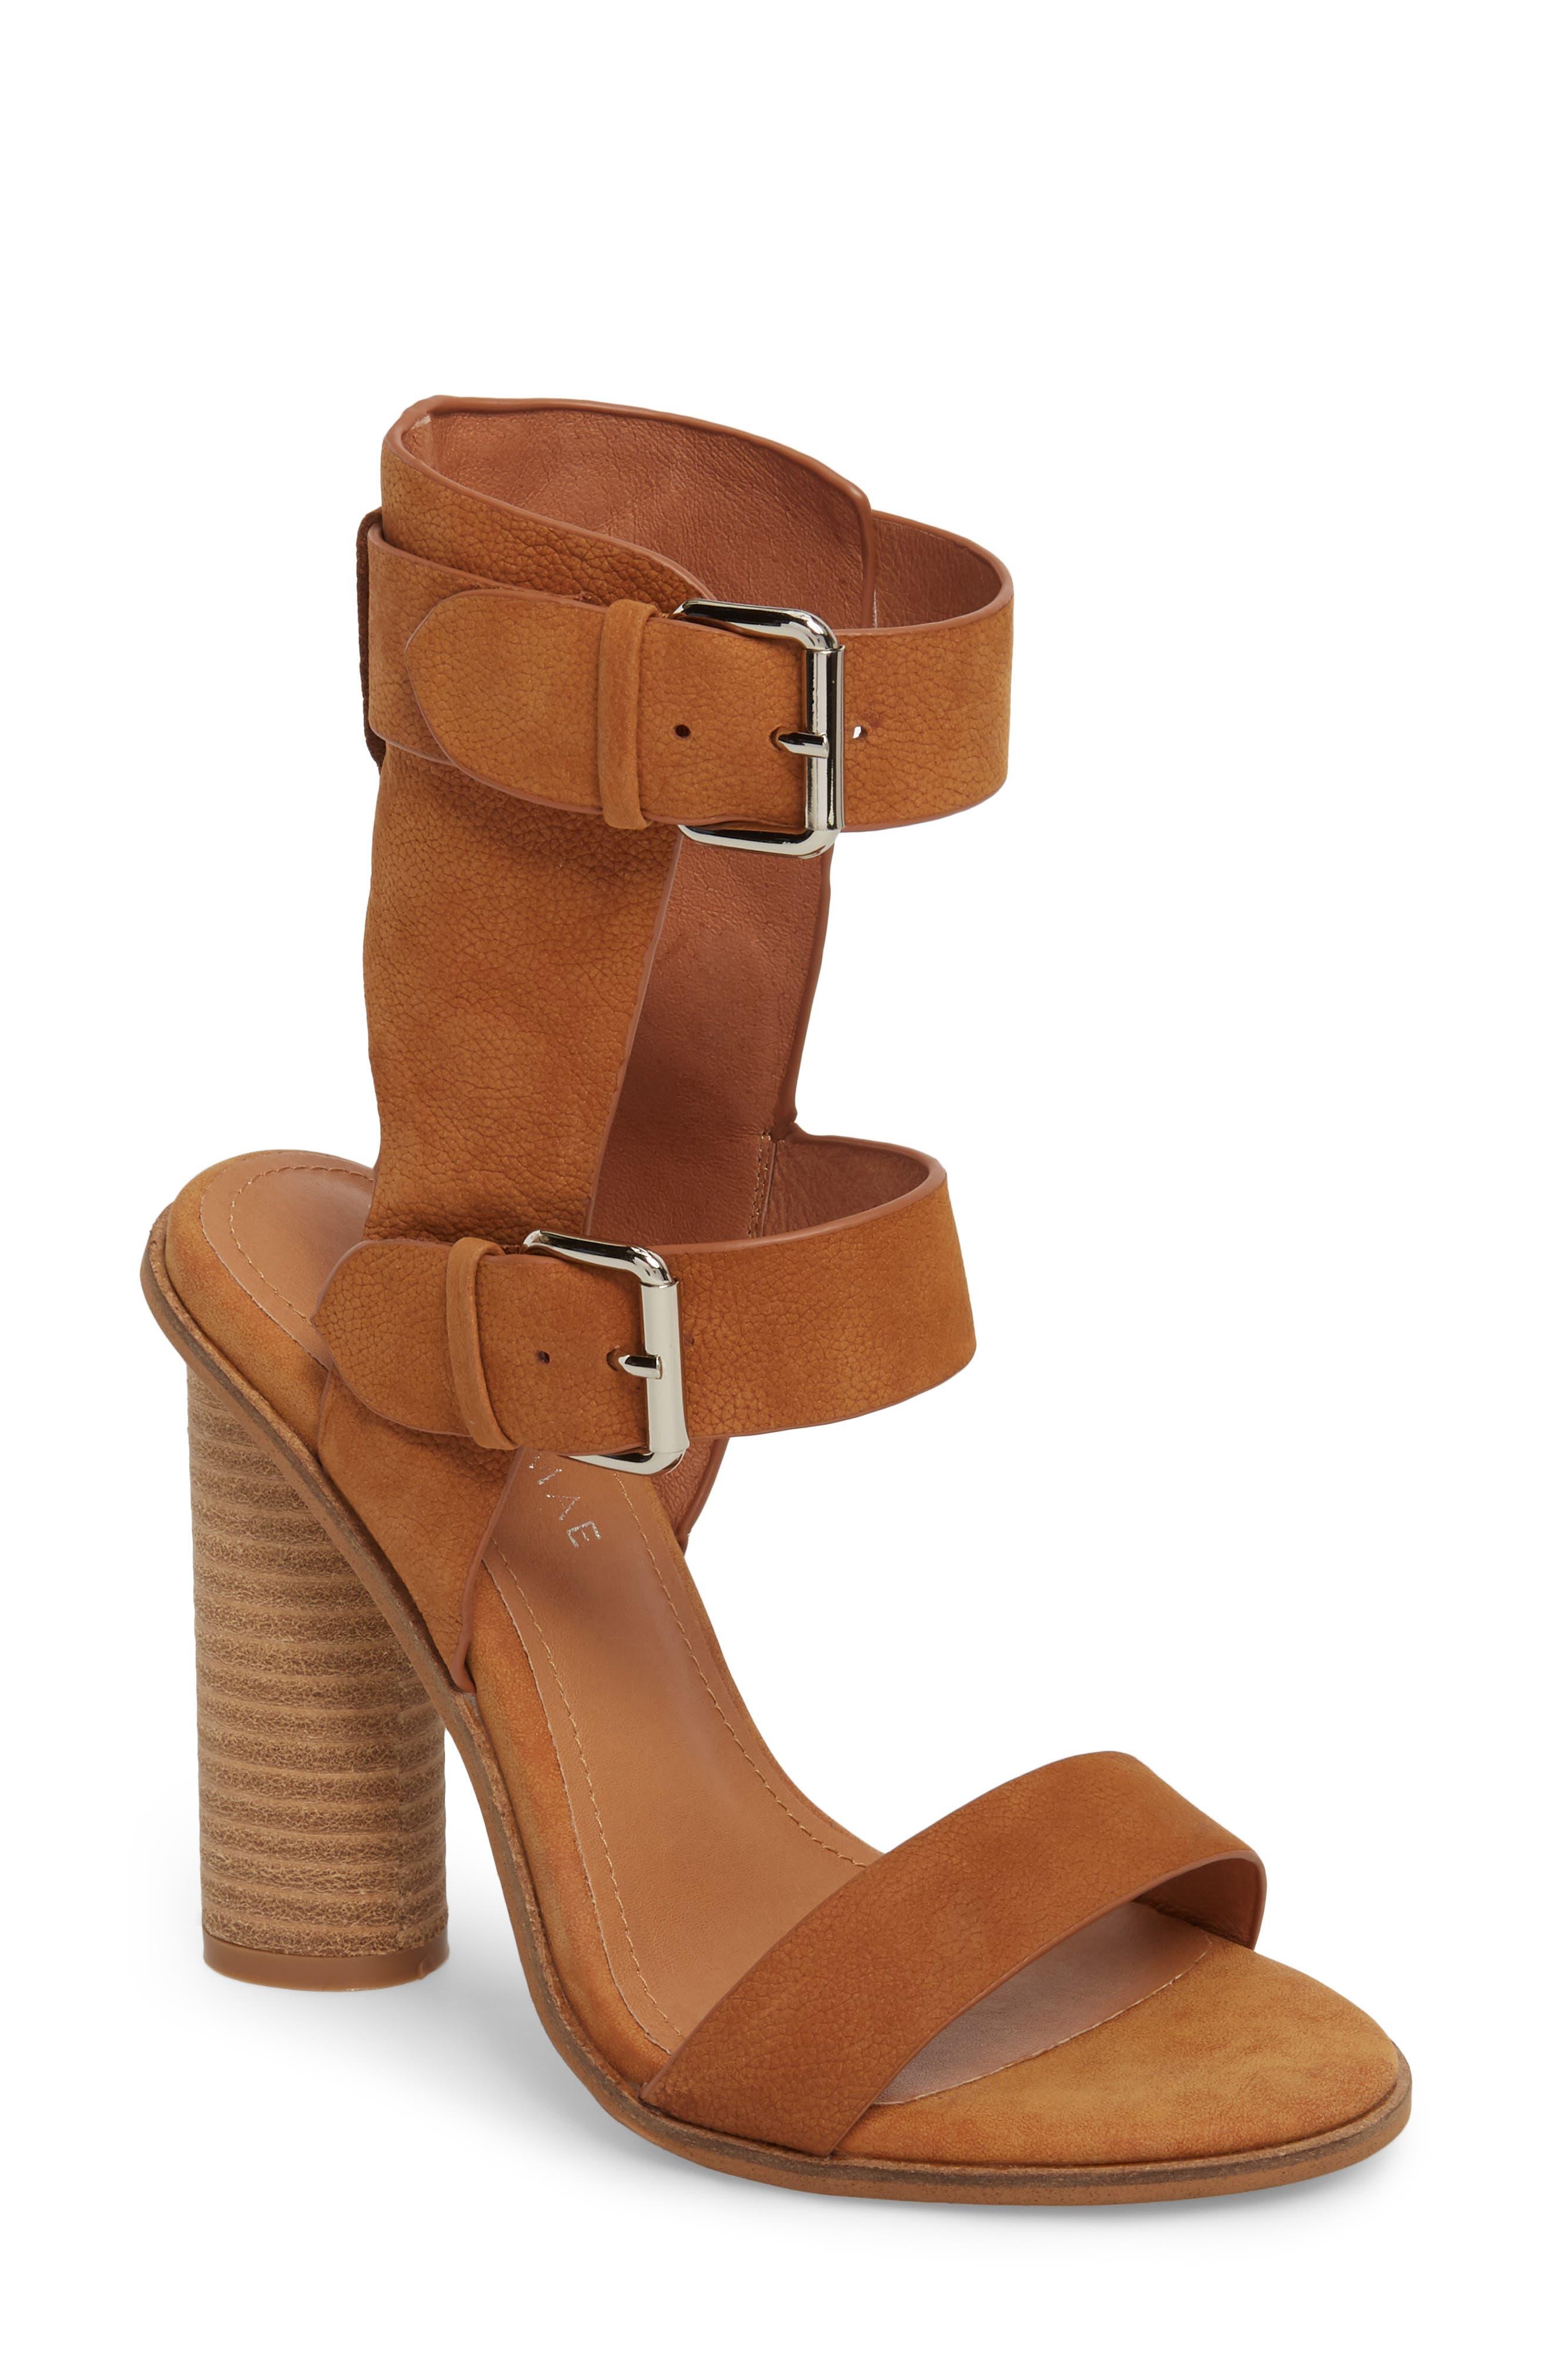 Abeba Block Heel Sandal,                         Main,                         color, Tan Leather